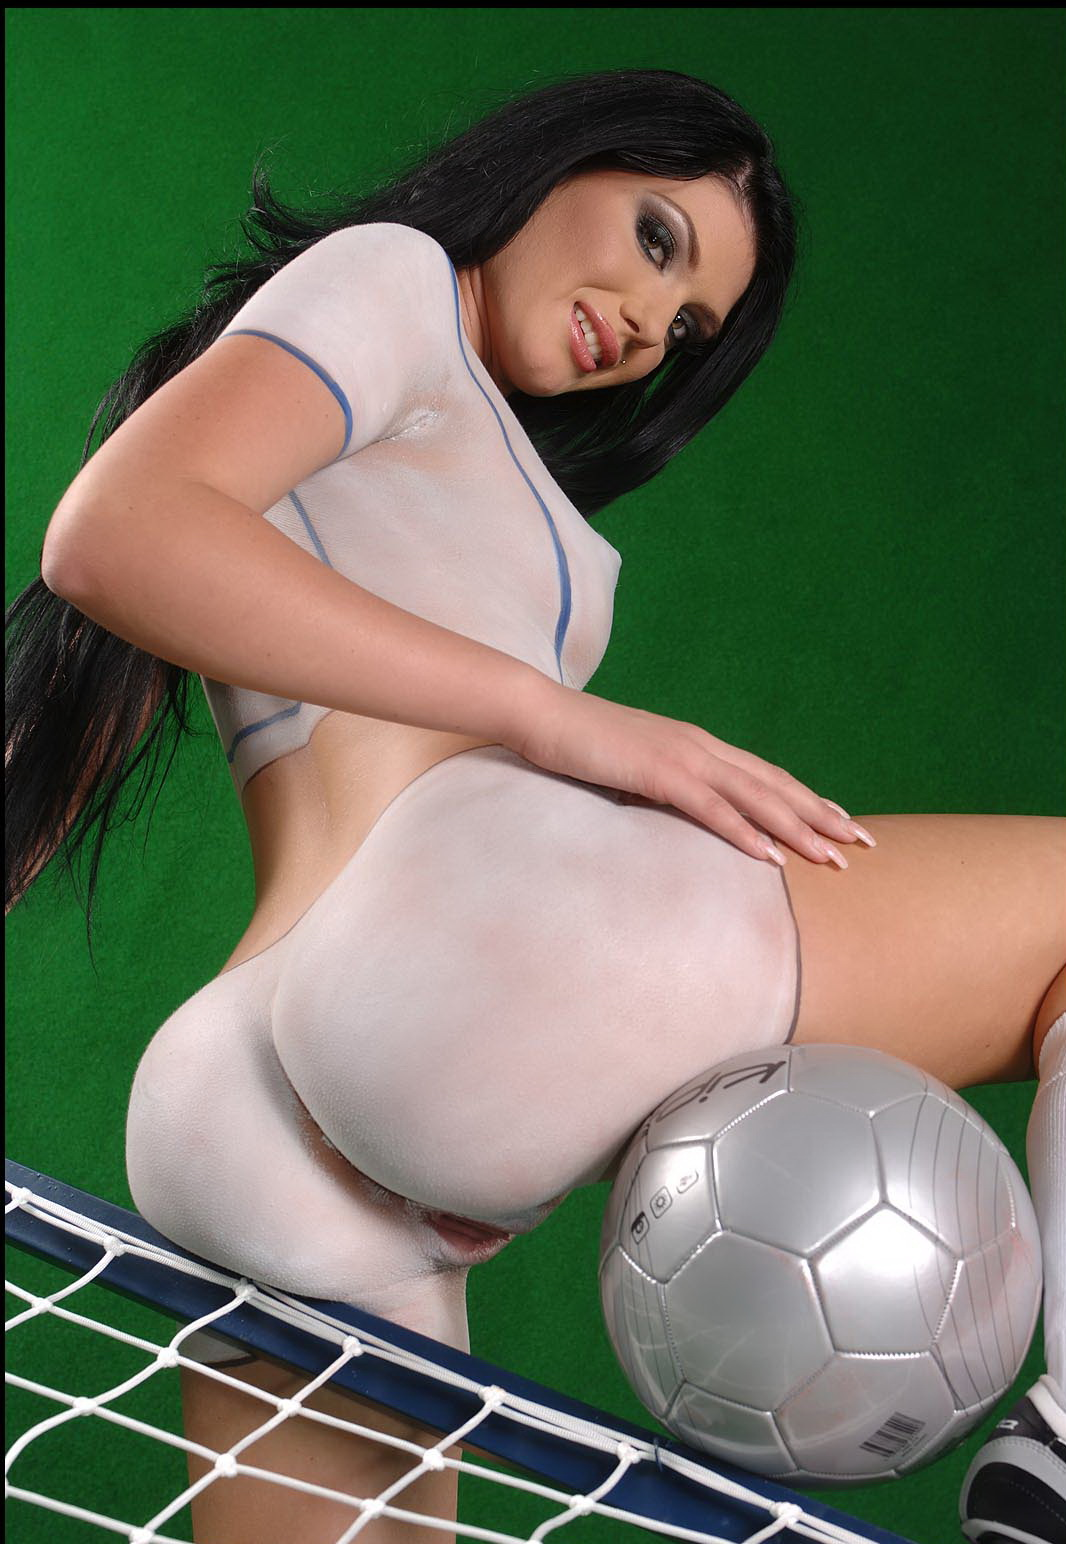 Bodyart Porn Pic Eporner